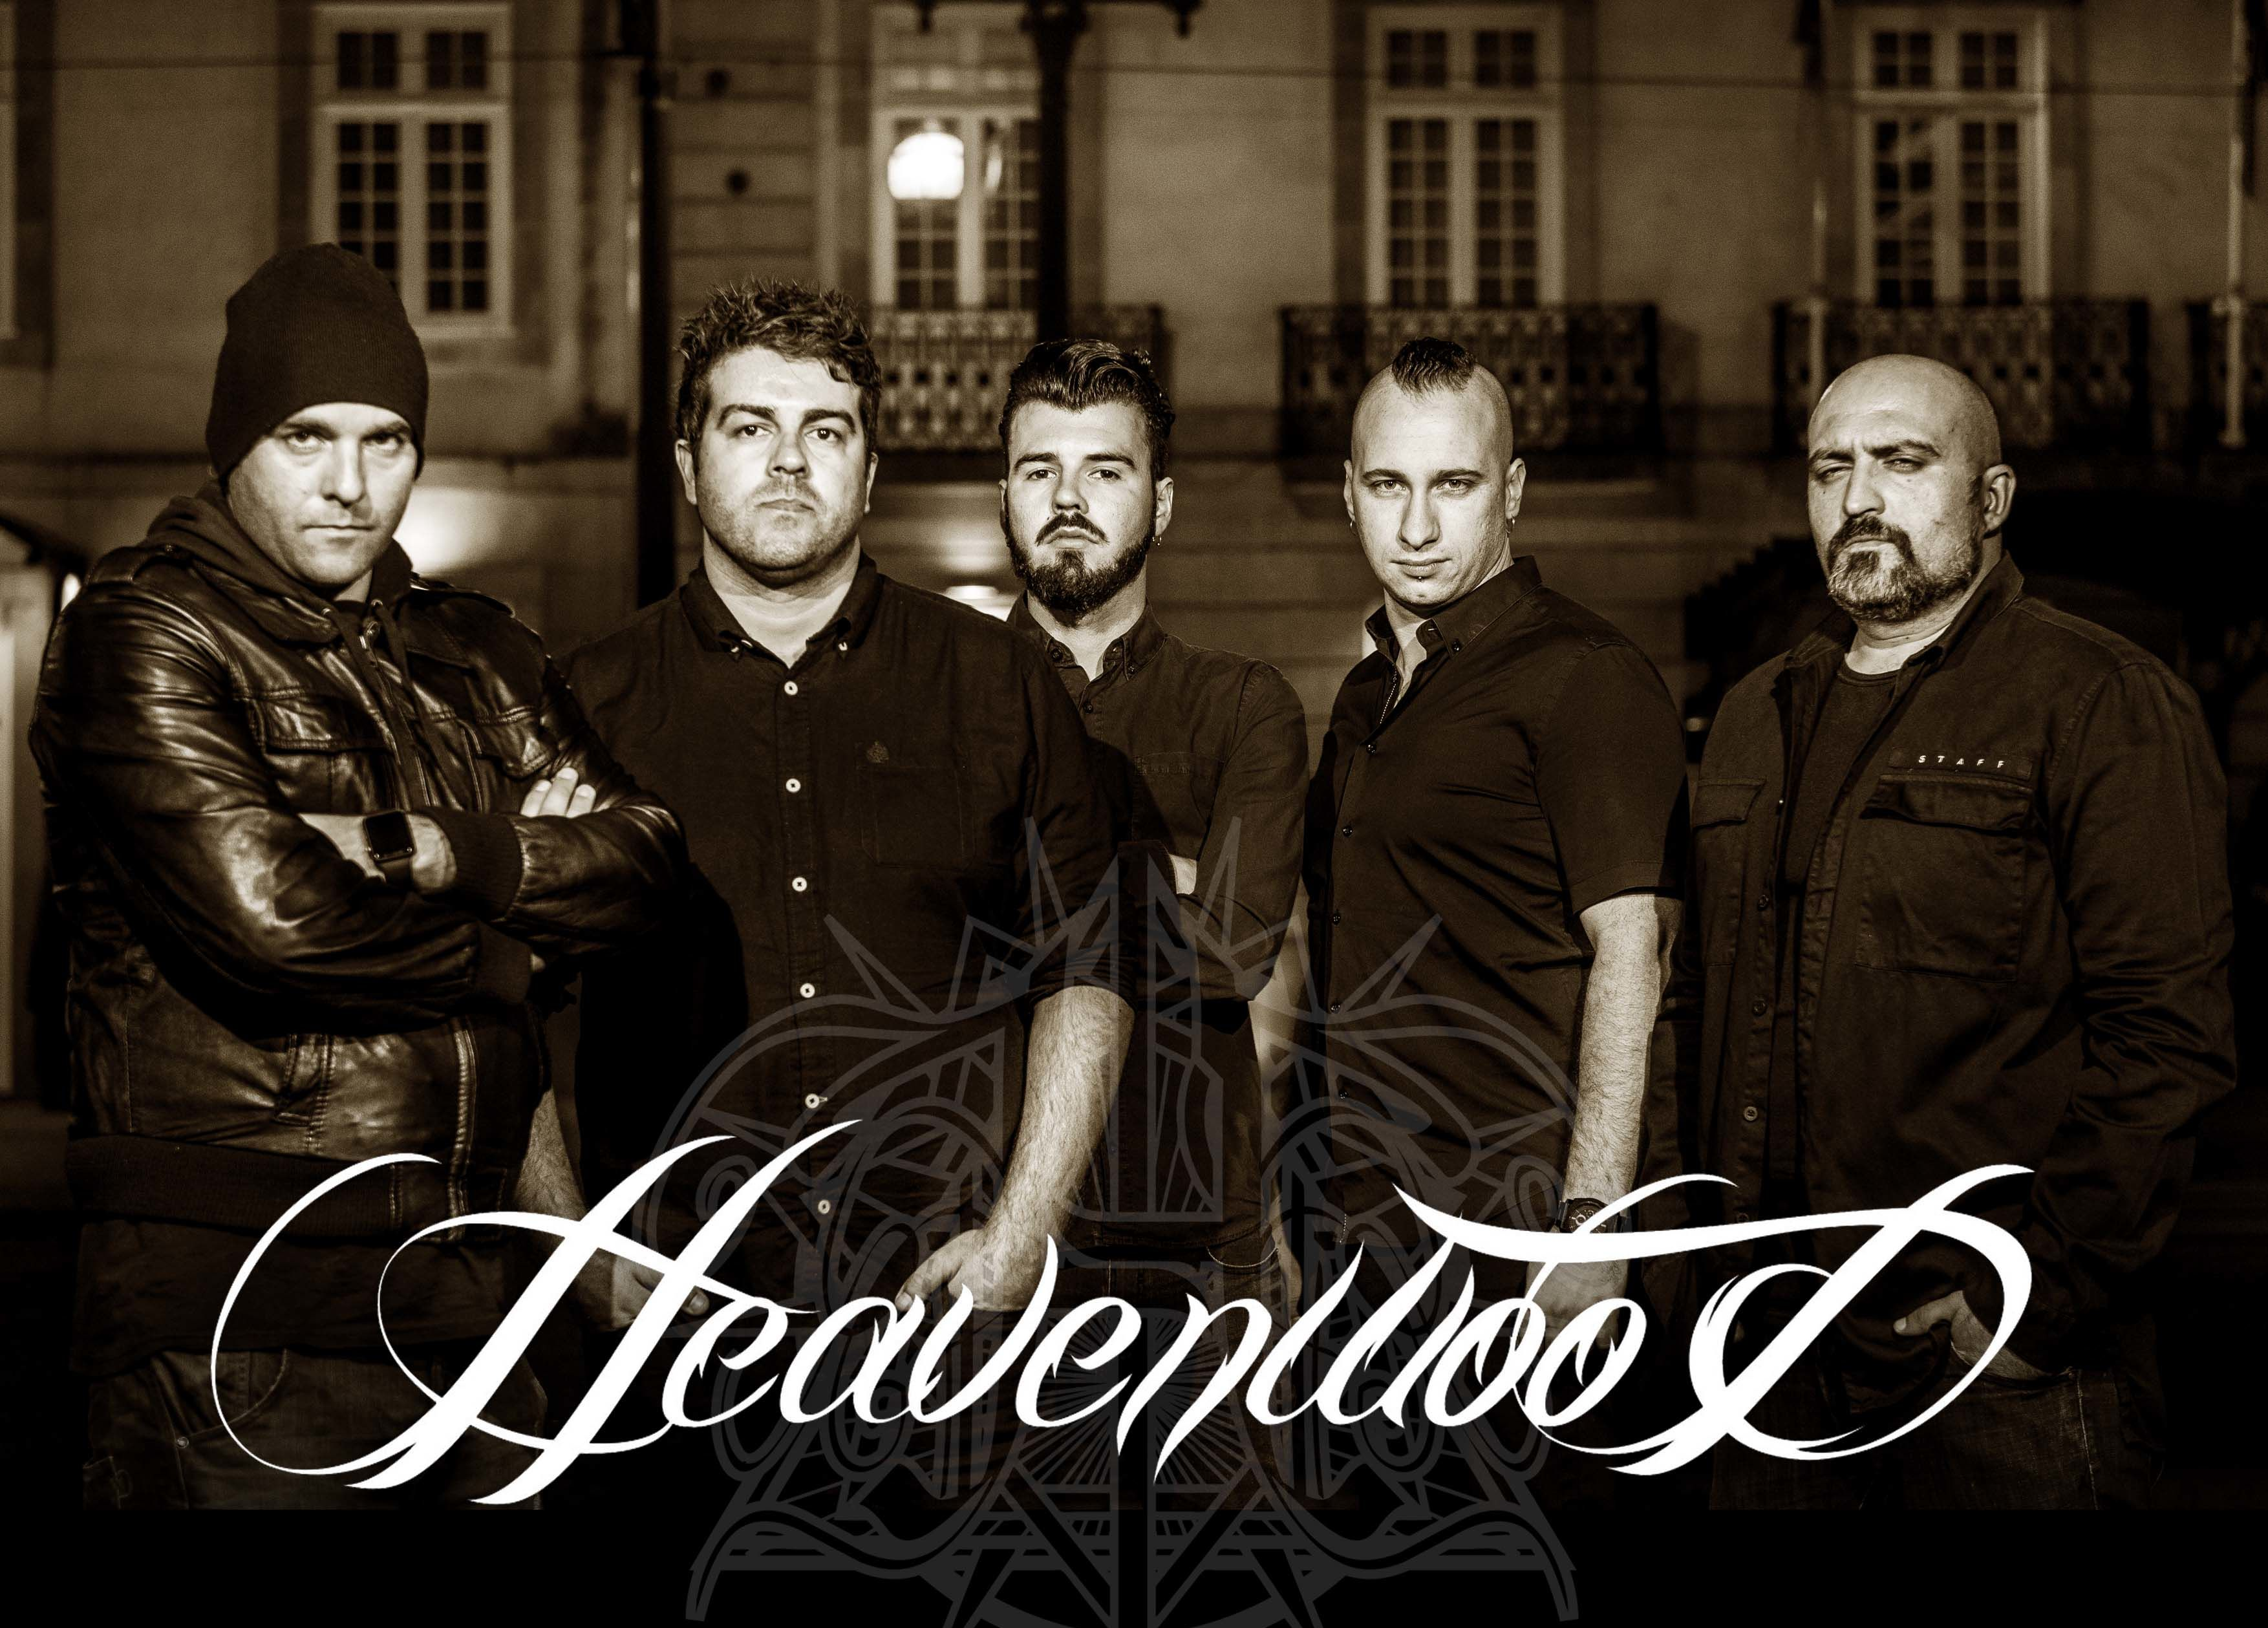 Heavenwood - GothicDark-Metal